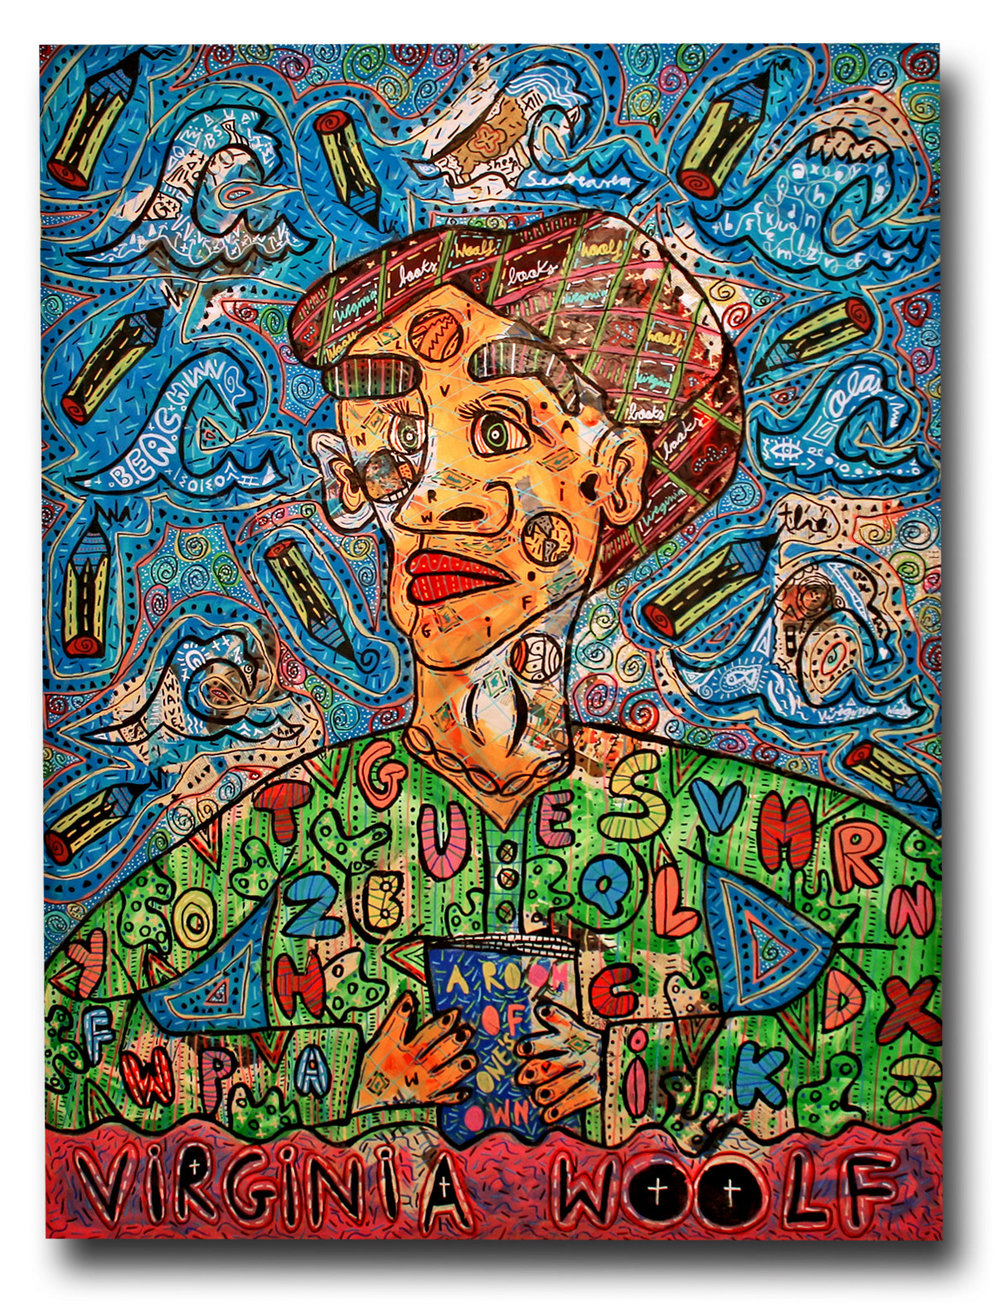 """Virginia Woolf"" , 2018   Acrylic paint and Posca marker on canvas, 180 x 200 cm"